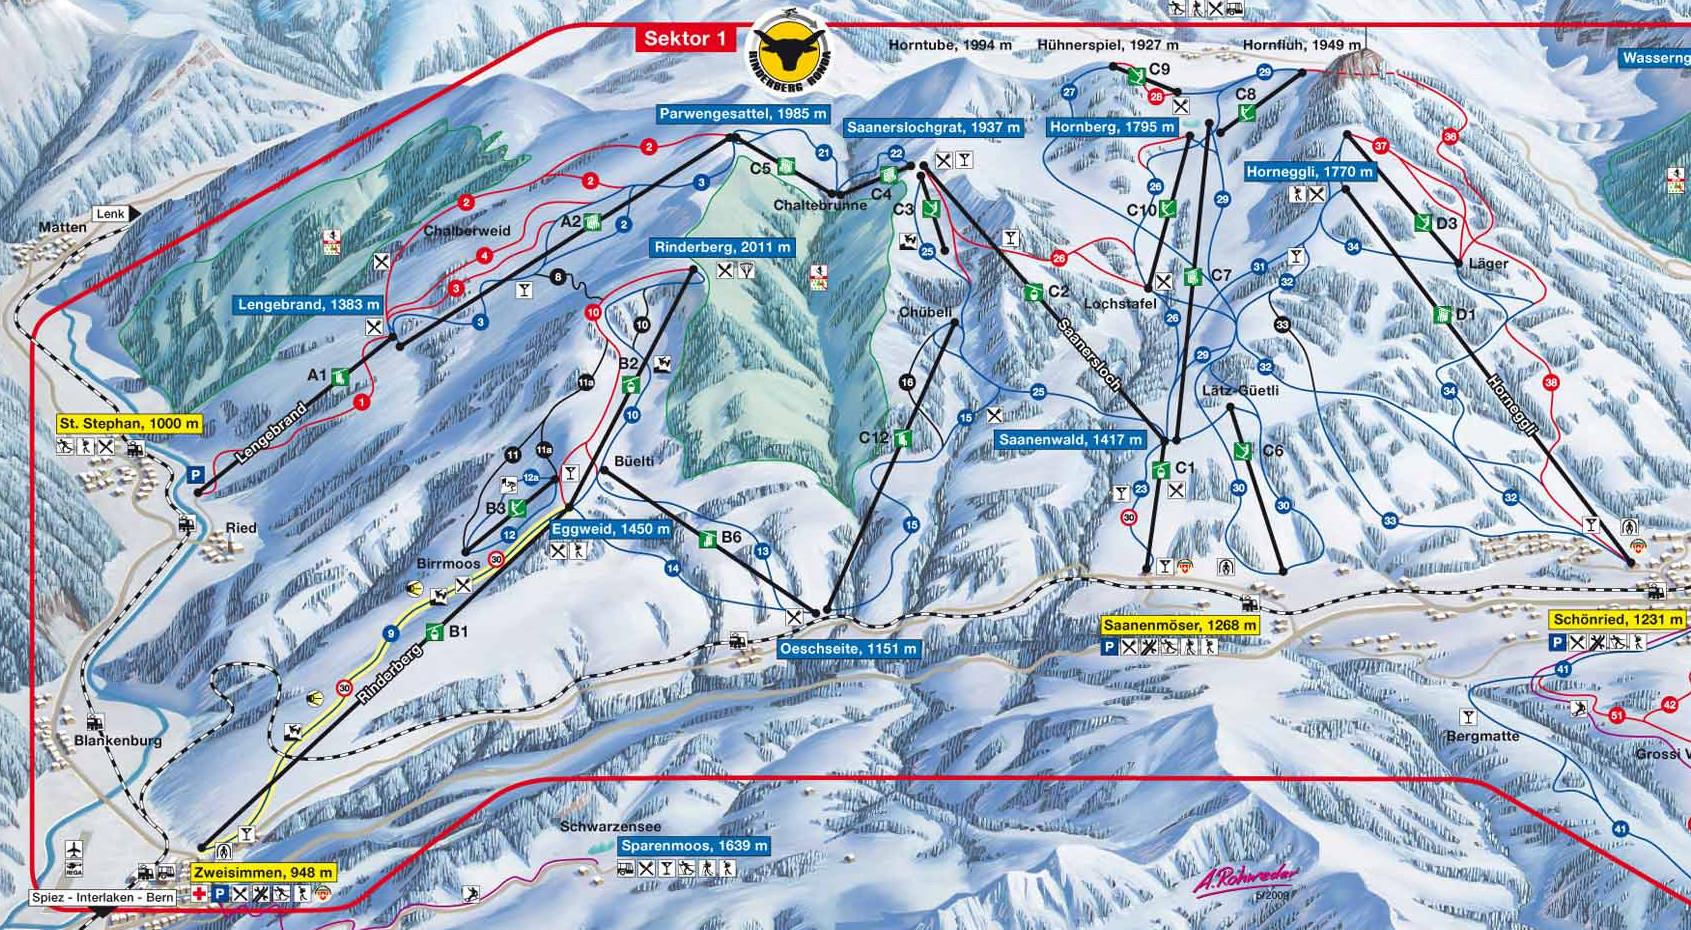 Lyžařská mapa sjezdovek areálu Rinderberg - Saanerslochgrat